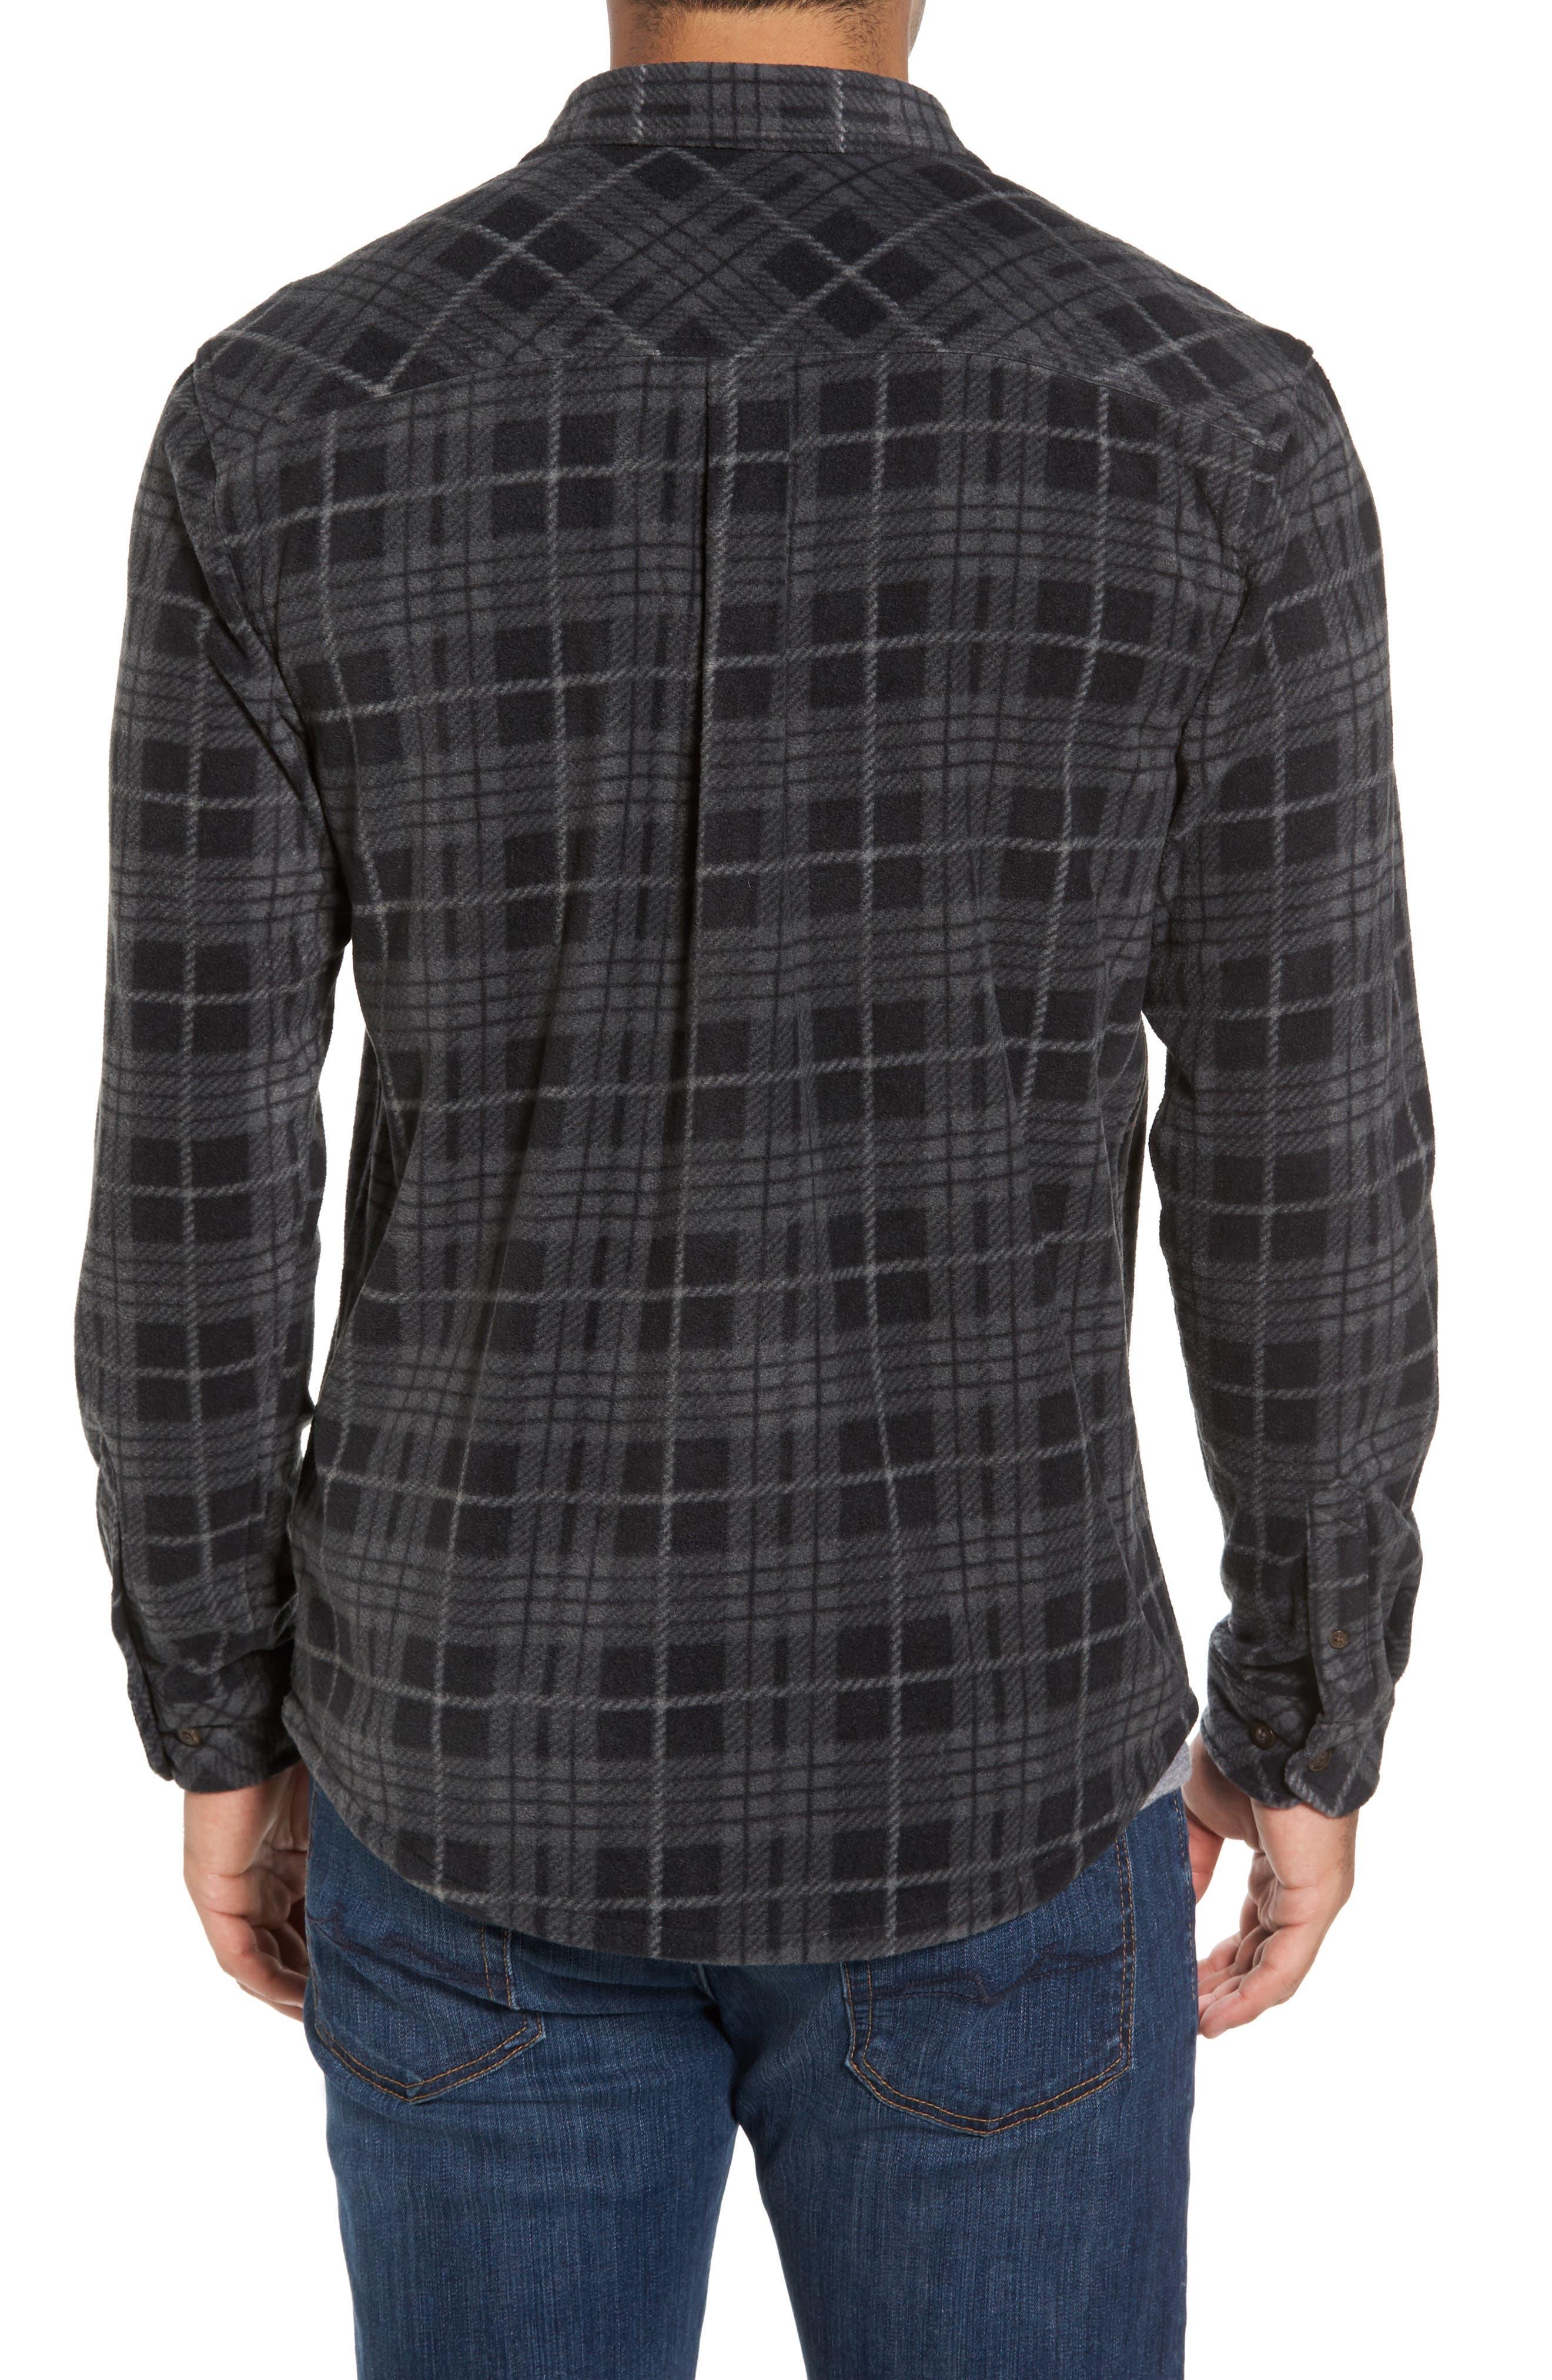 Breakers Regular Fit Plaid Fleece Shirt,                             Alternate thumbnail 2, color,                             001